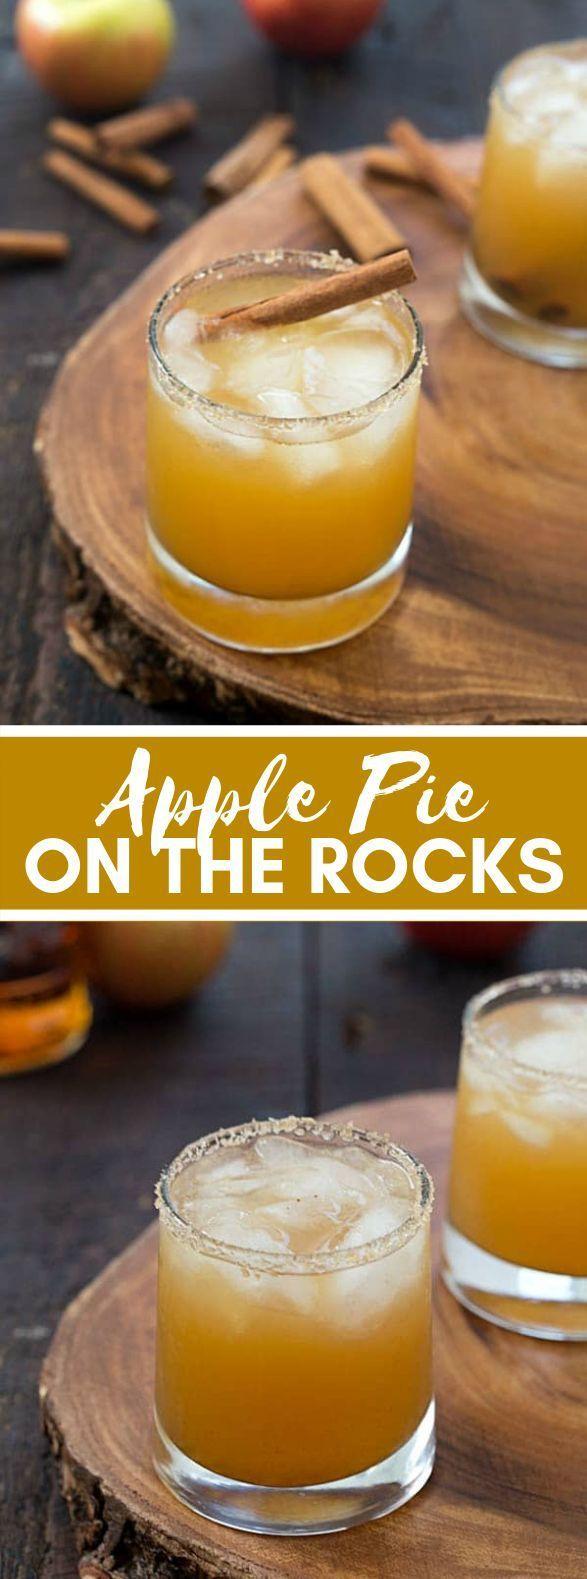 Apple pie on the Rocks | Holiday Drinks thanksgiving #thanksgiving #christmas #drinks #apple #cocktails